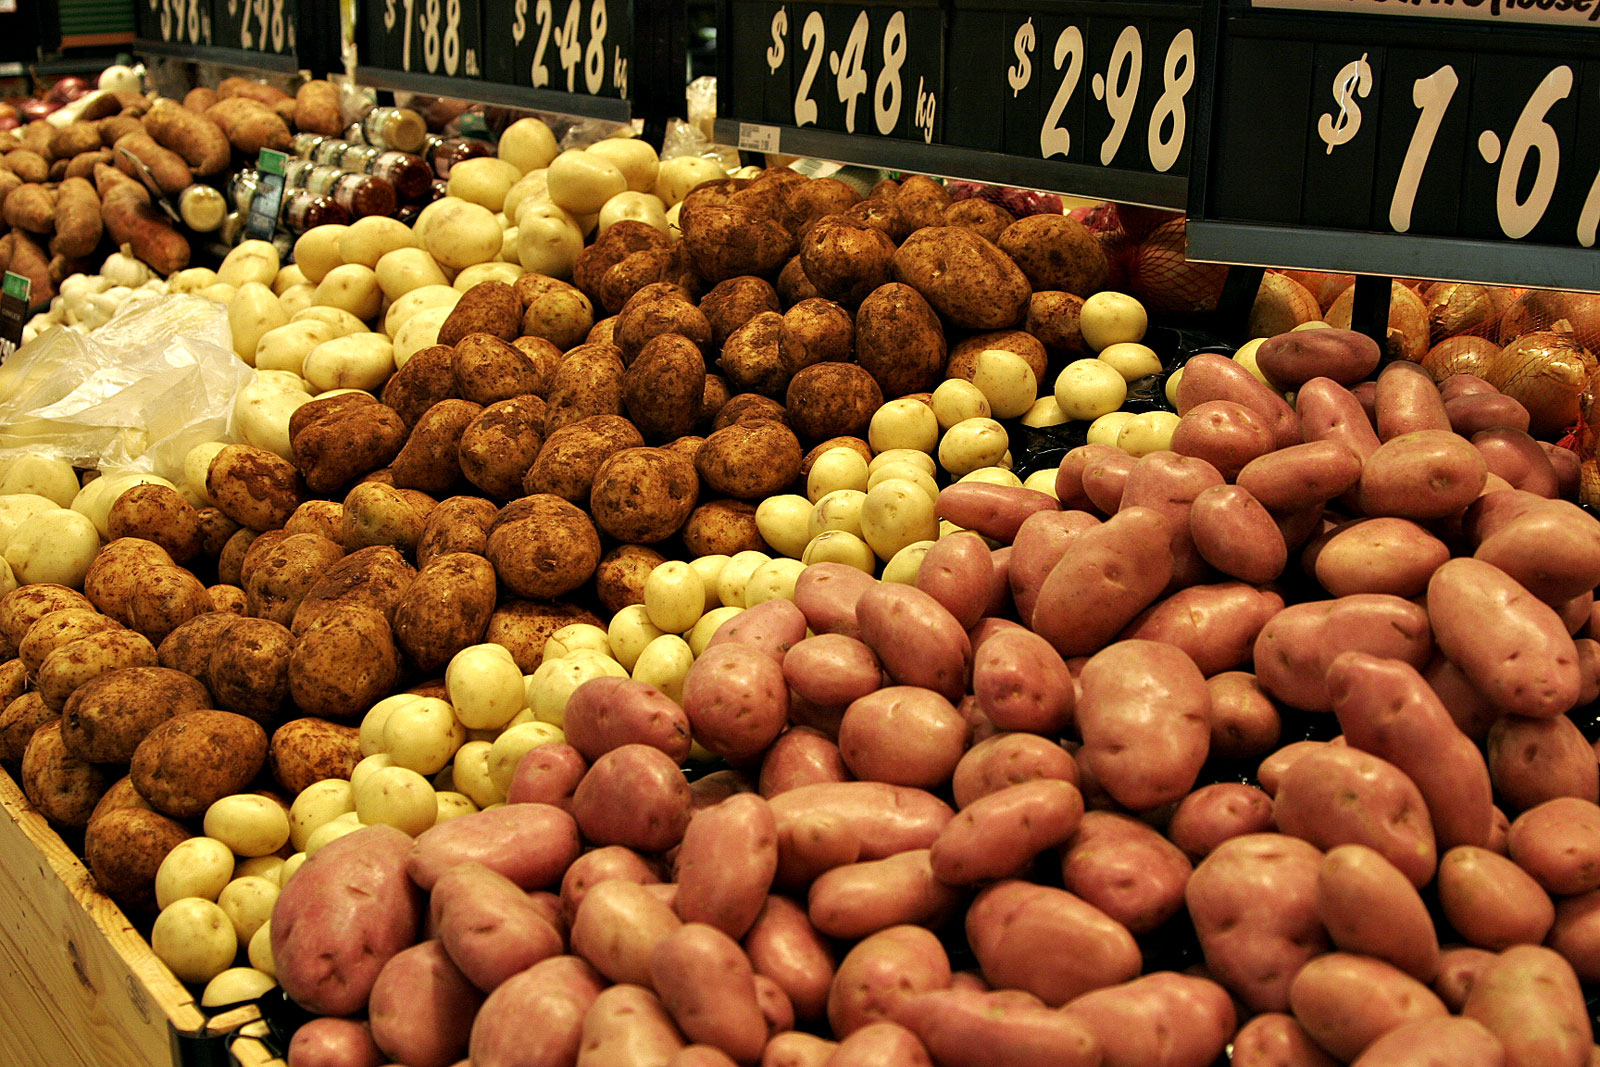 Kartoffelvarietäten (Quelle: Wikipedia)